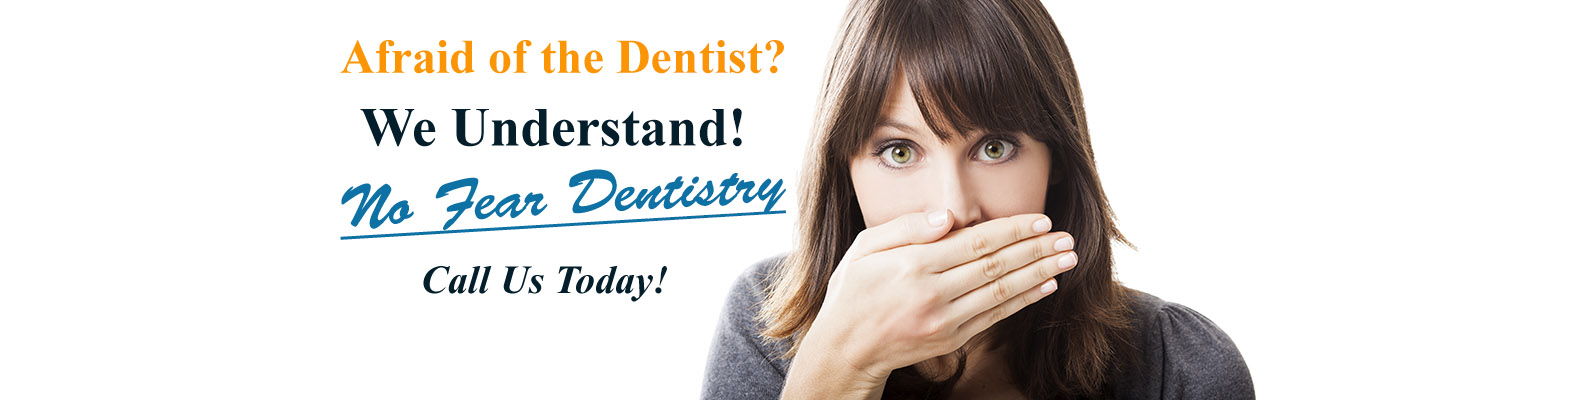 no-fear-dentistry